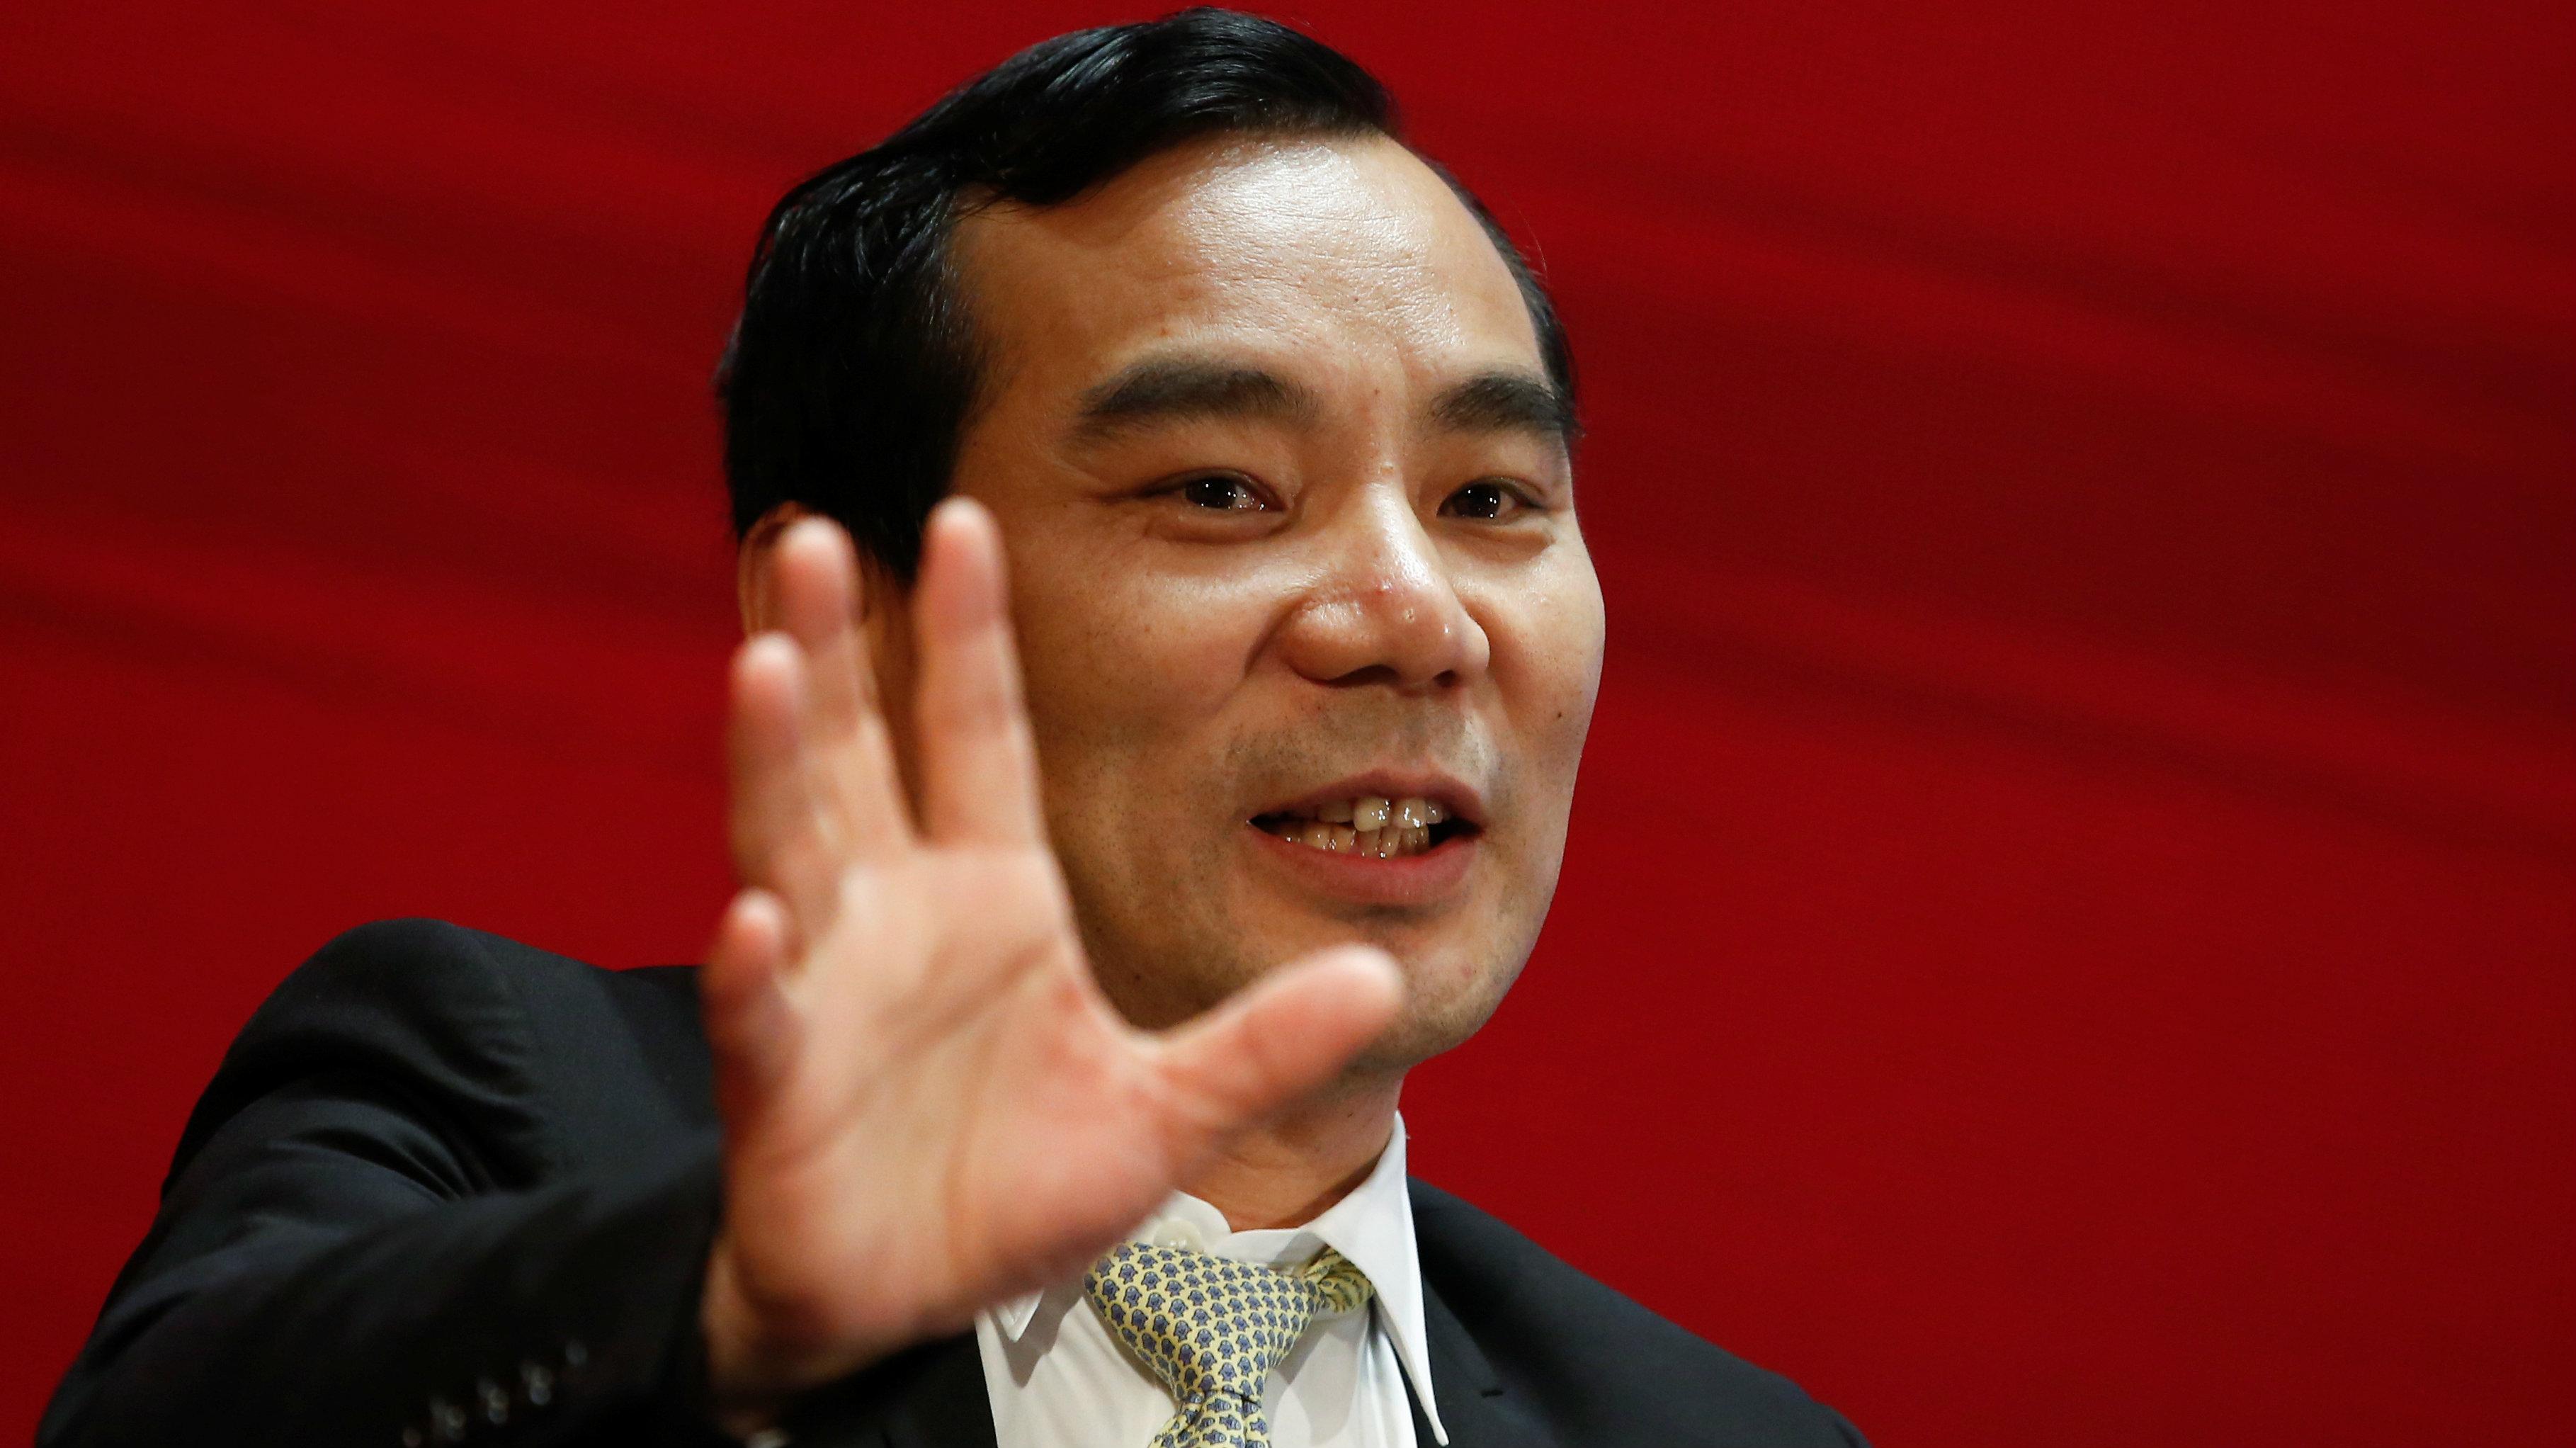 china is imprisoning anbang chairman wu xiaohui tycoon who bought